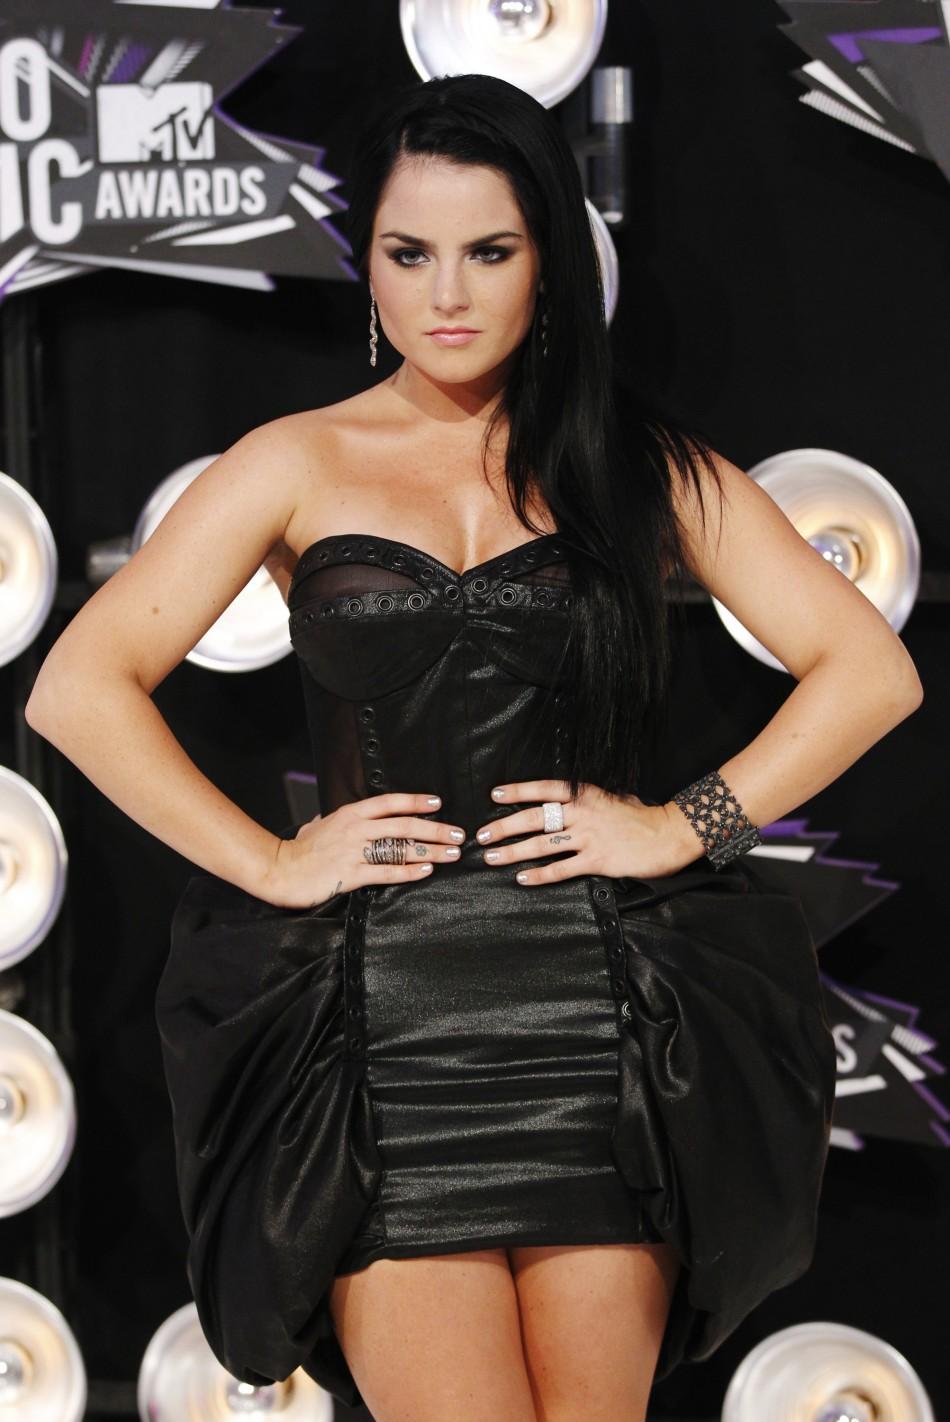 MTV Video Music Awards 2011 Top 10 Red Carpet Fashion.